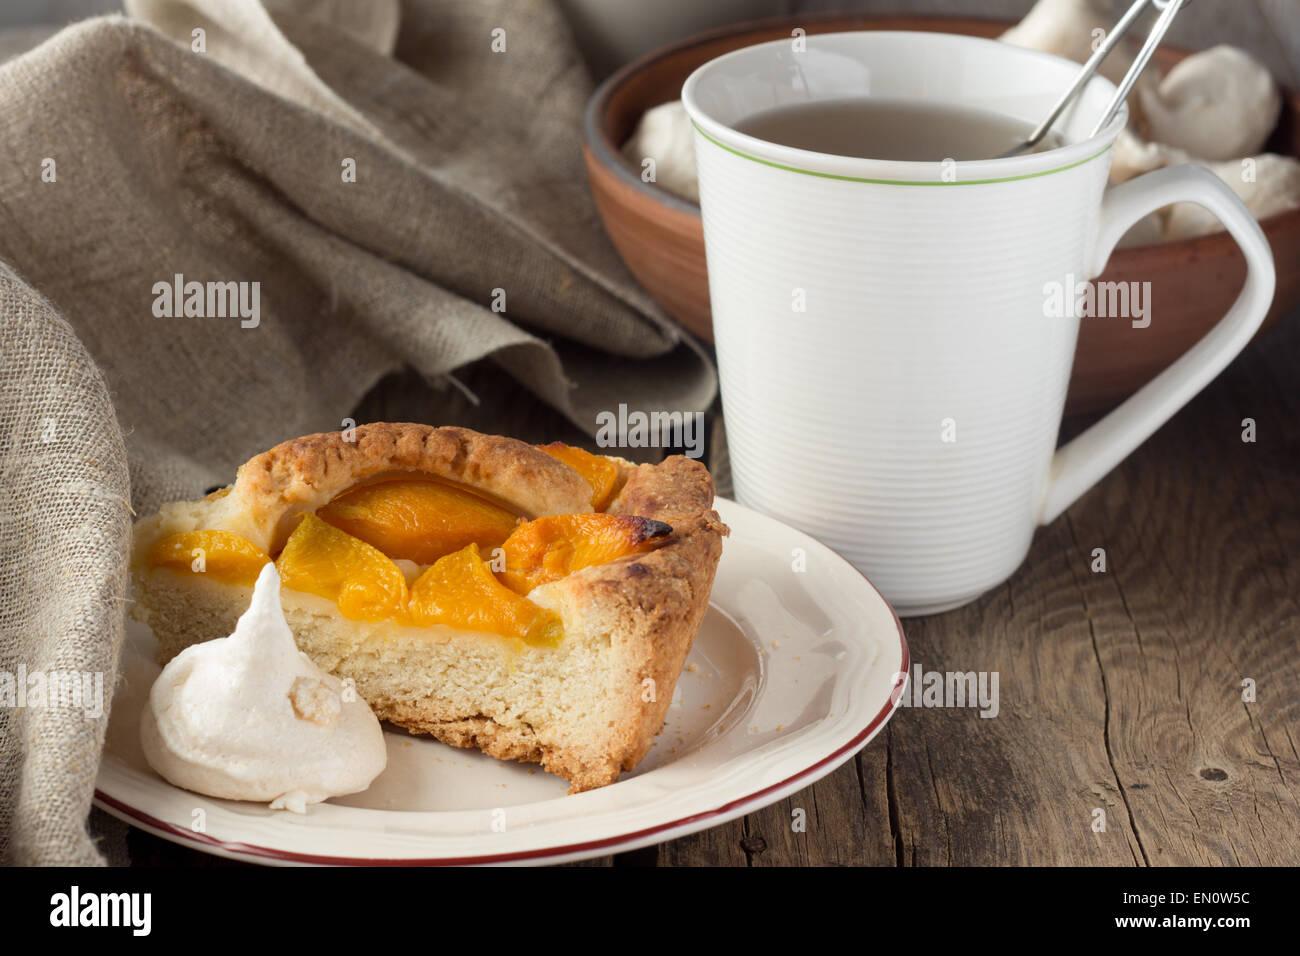 Shortcrust peach pie, meringue and cup of tea selective focus horizontal - Stock Image